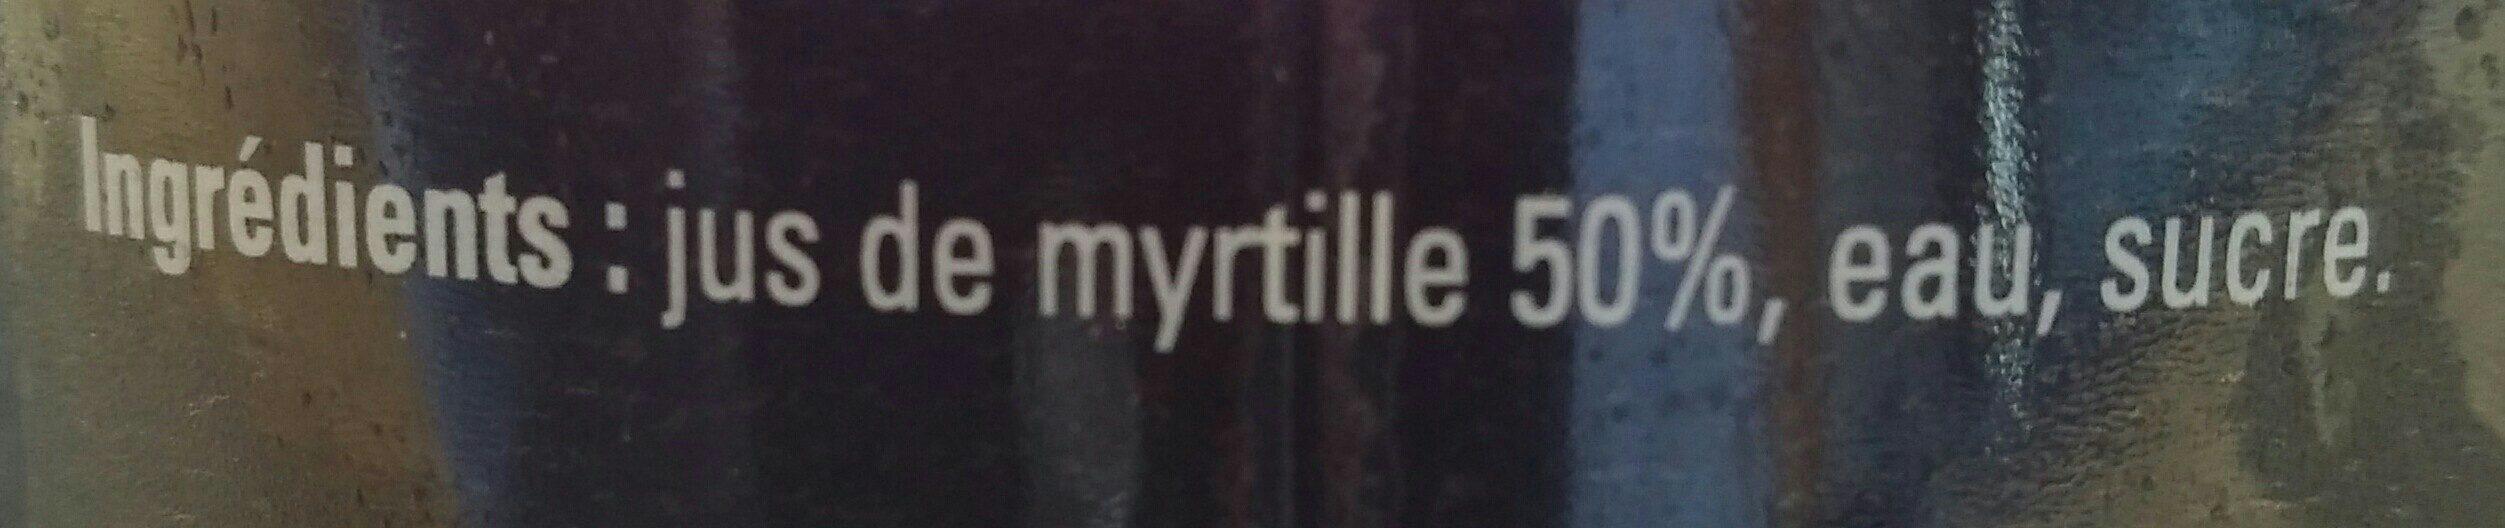 Nectar de Myrtille - Ingredients - fr